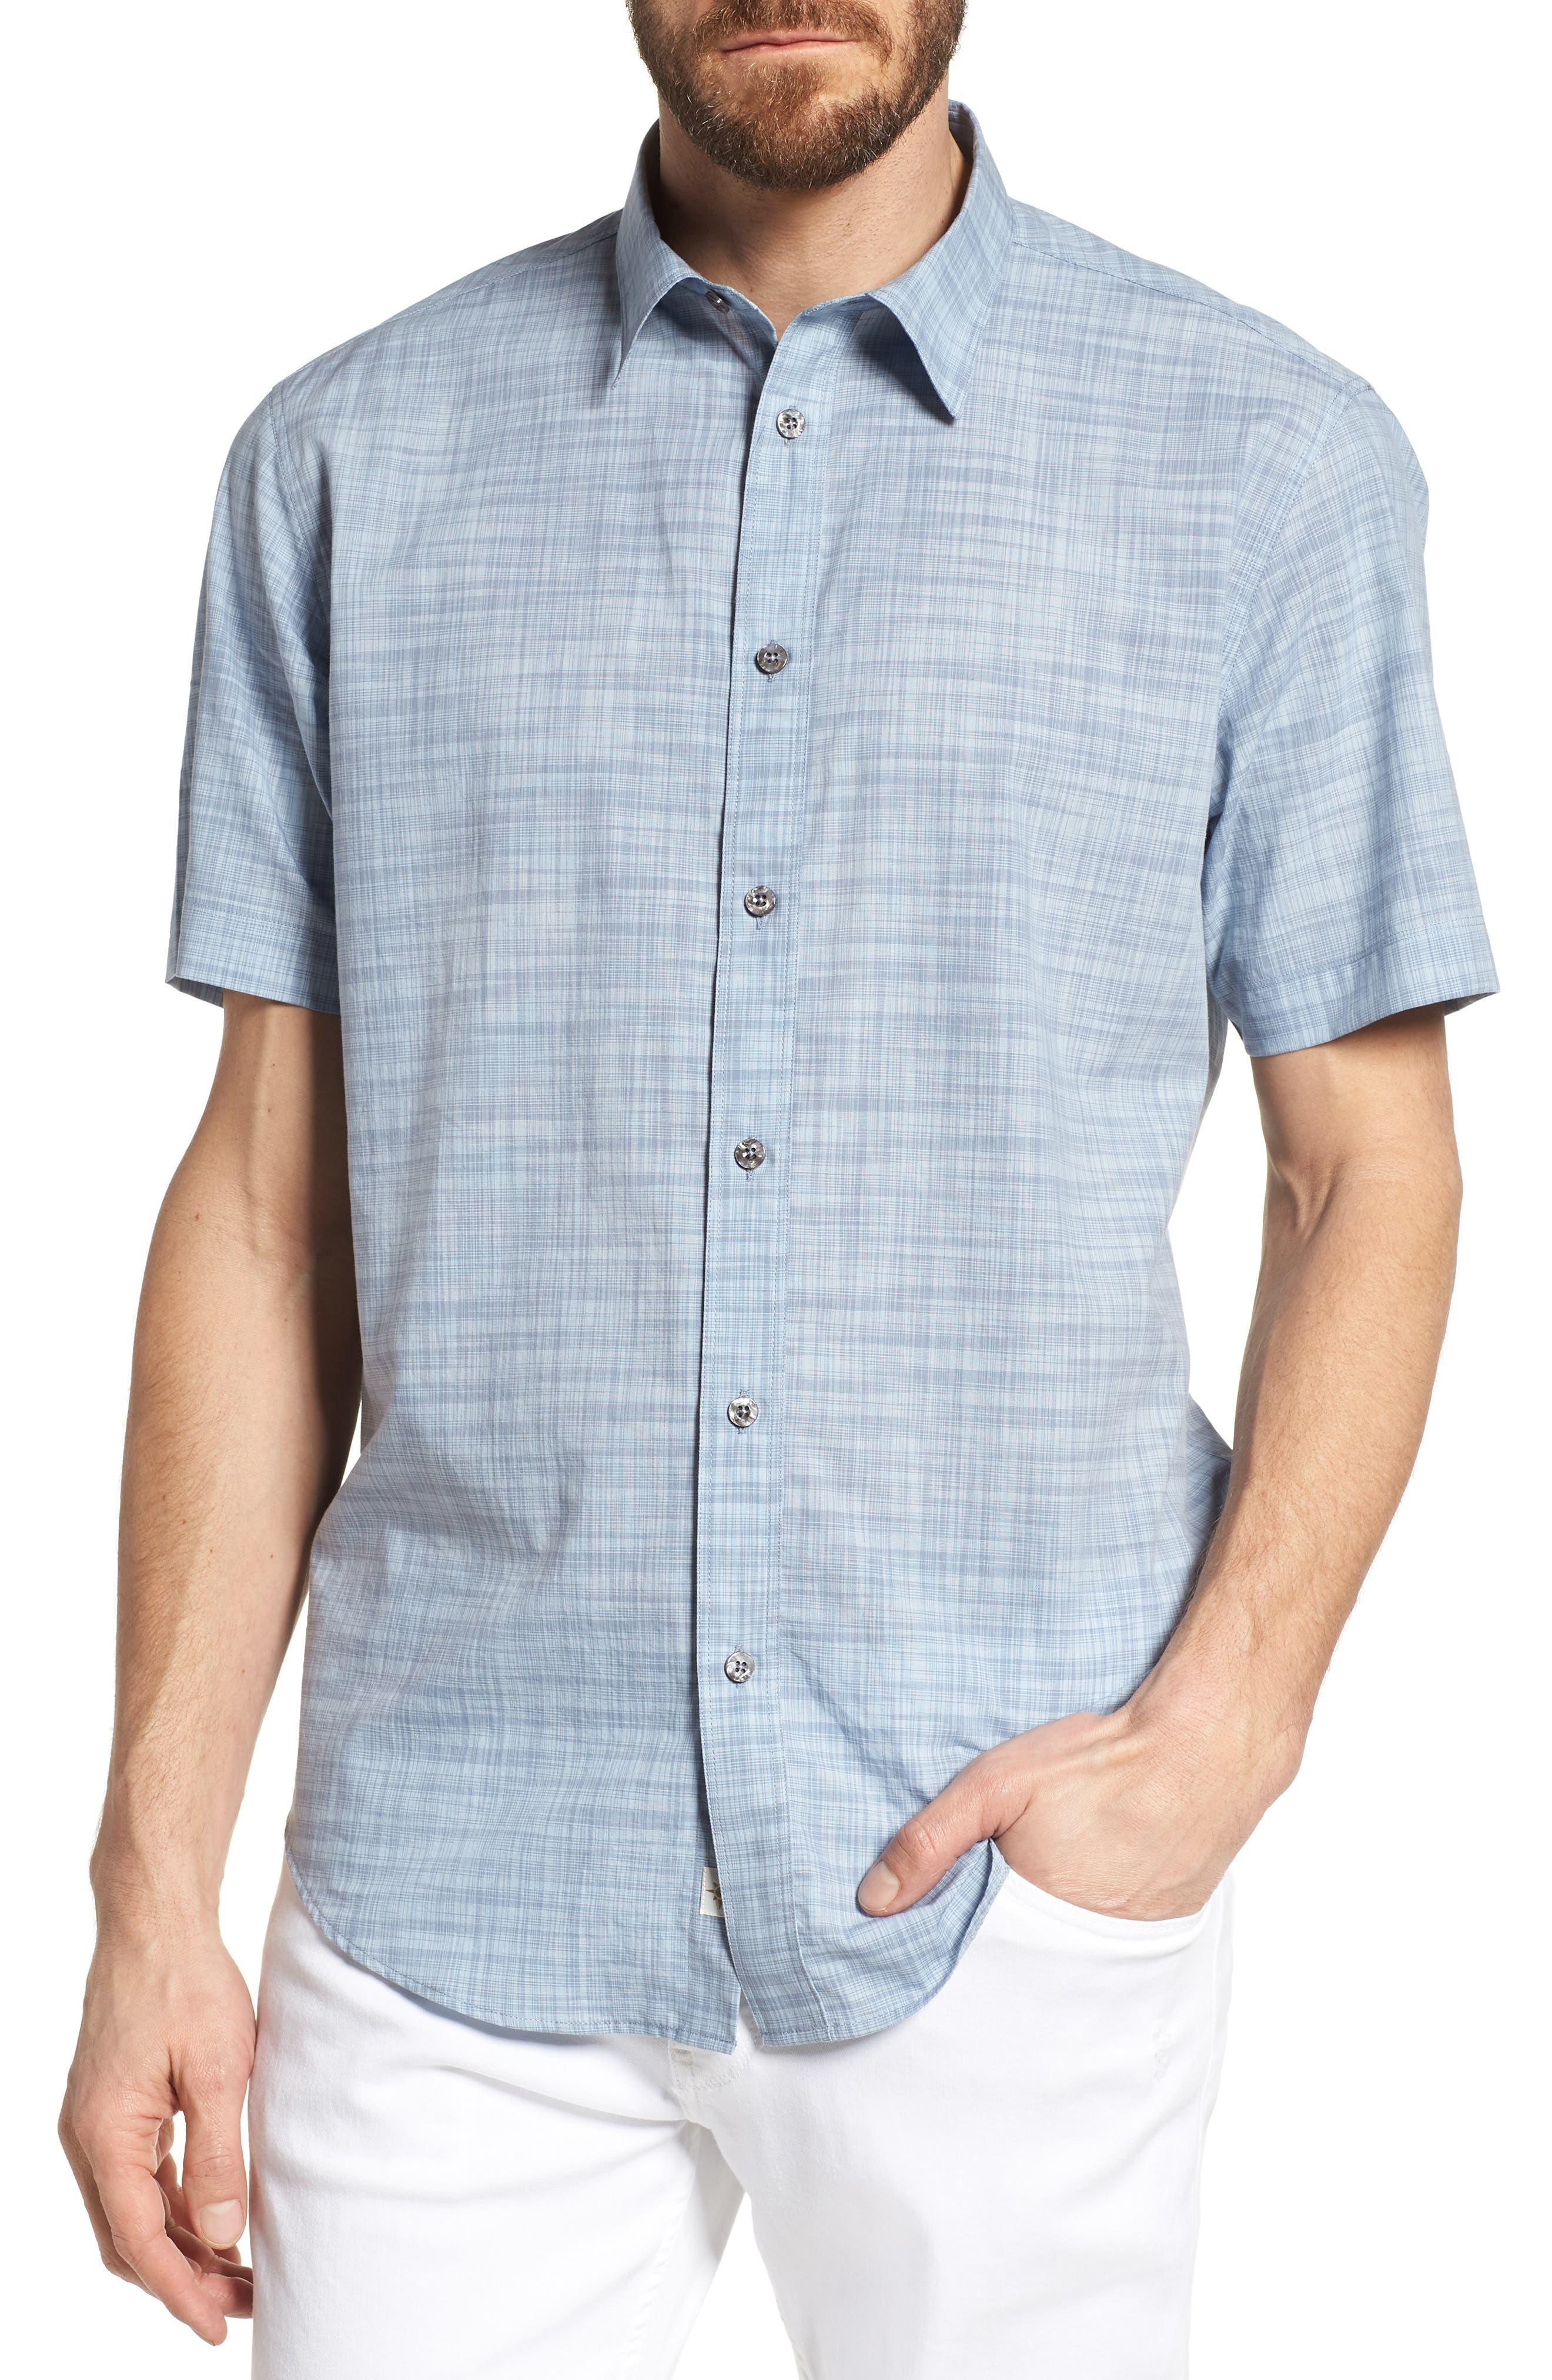 Coastaoro Joya Regular Fit Plaid Short Sleeve Sport Shirt